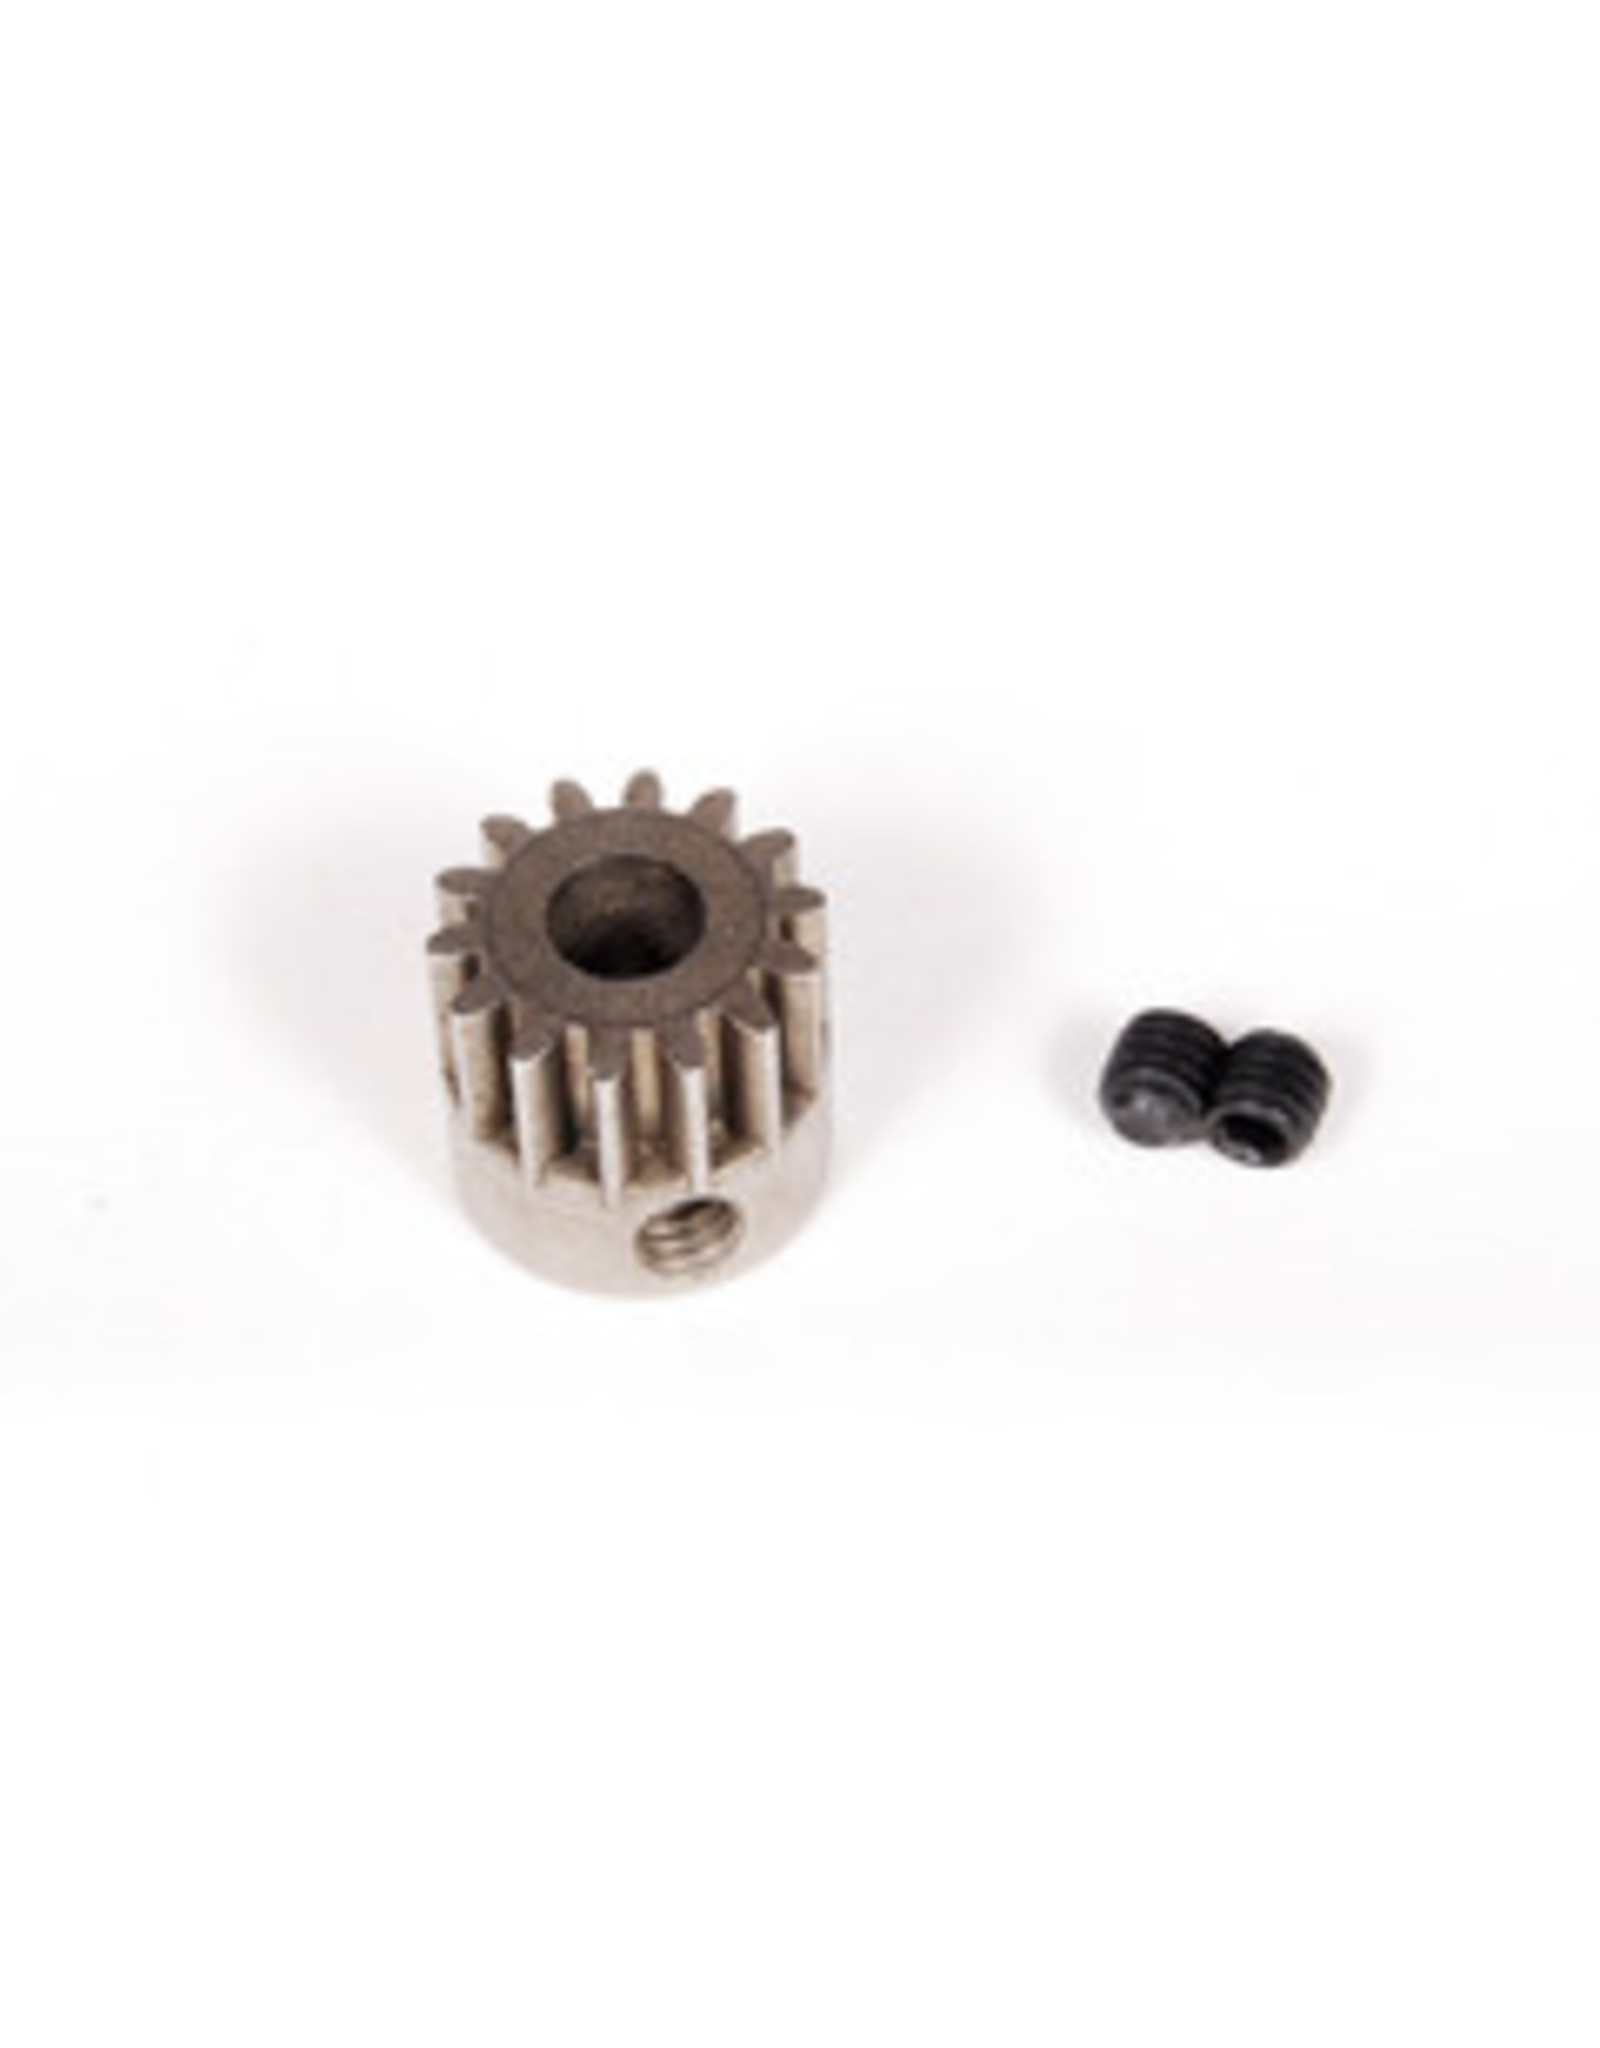 Axial Axial Pinion Gear 32P 14T Steel 5mm Motor Shaft (AX30840)